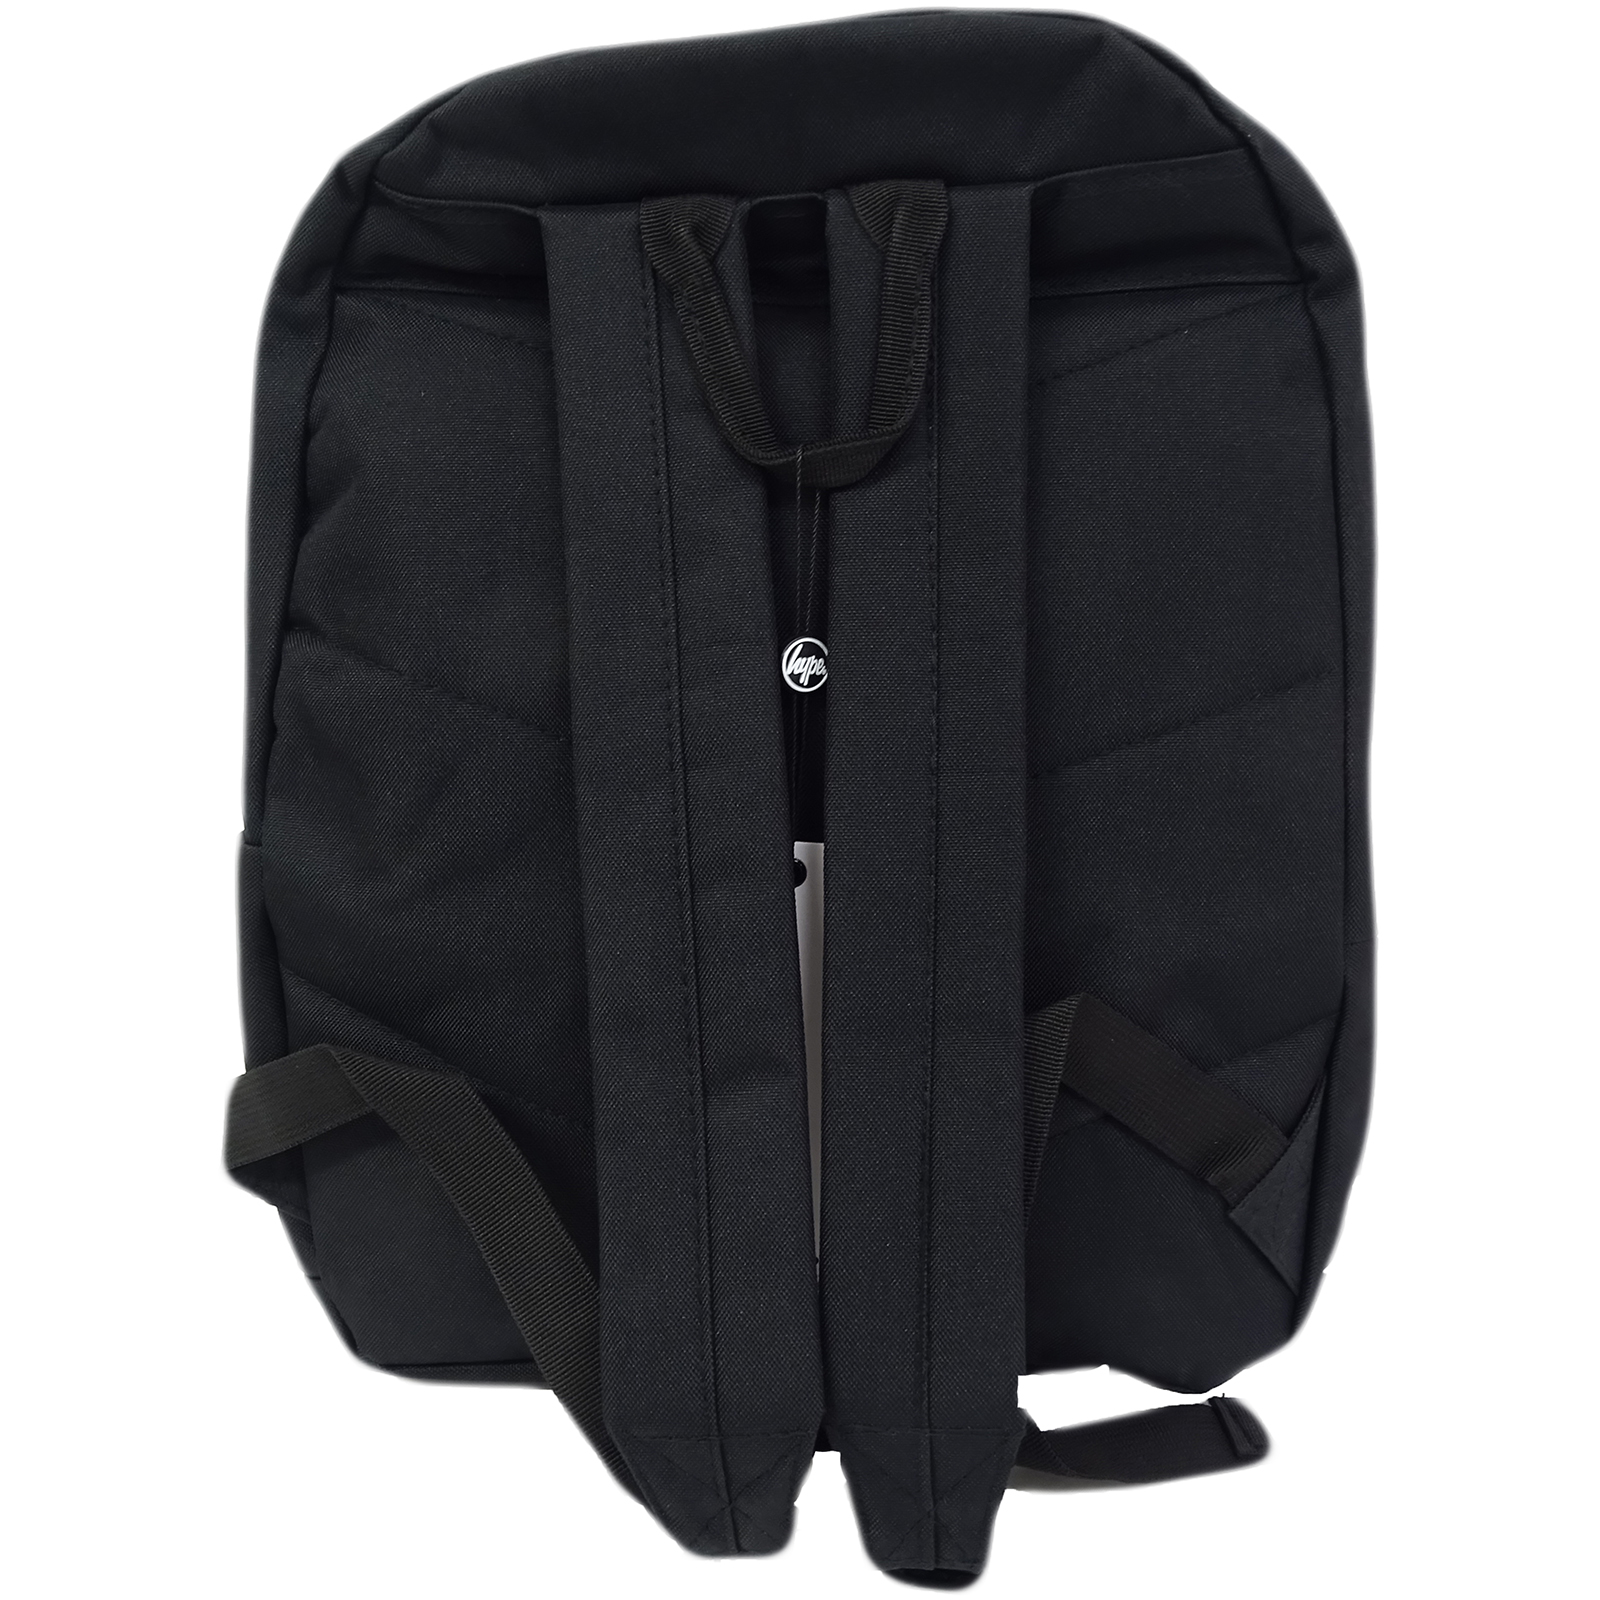 Unisexe-Hype-Sac-A-Dos-Ecole-Gym-SACS-pochettes-pencil-case miniature 17